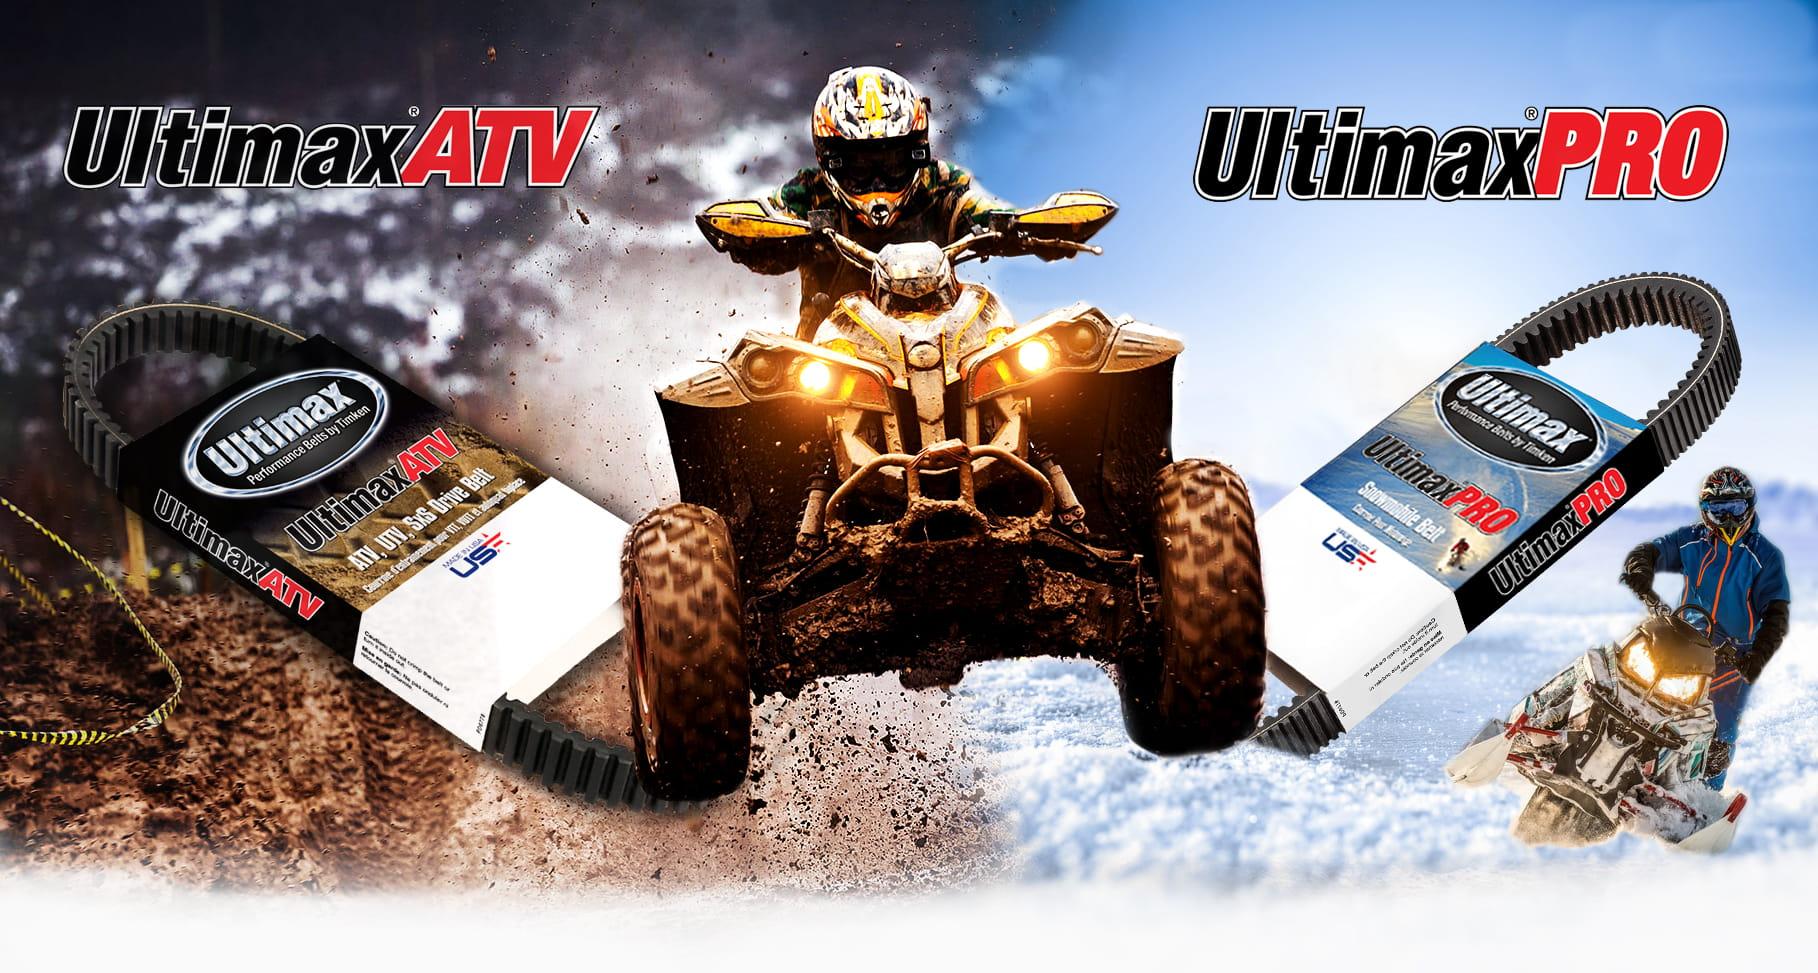 Powersports Belts by Ultimax - ATV Belts, UTV Belts, Snowmobile Belts